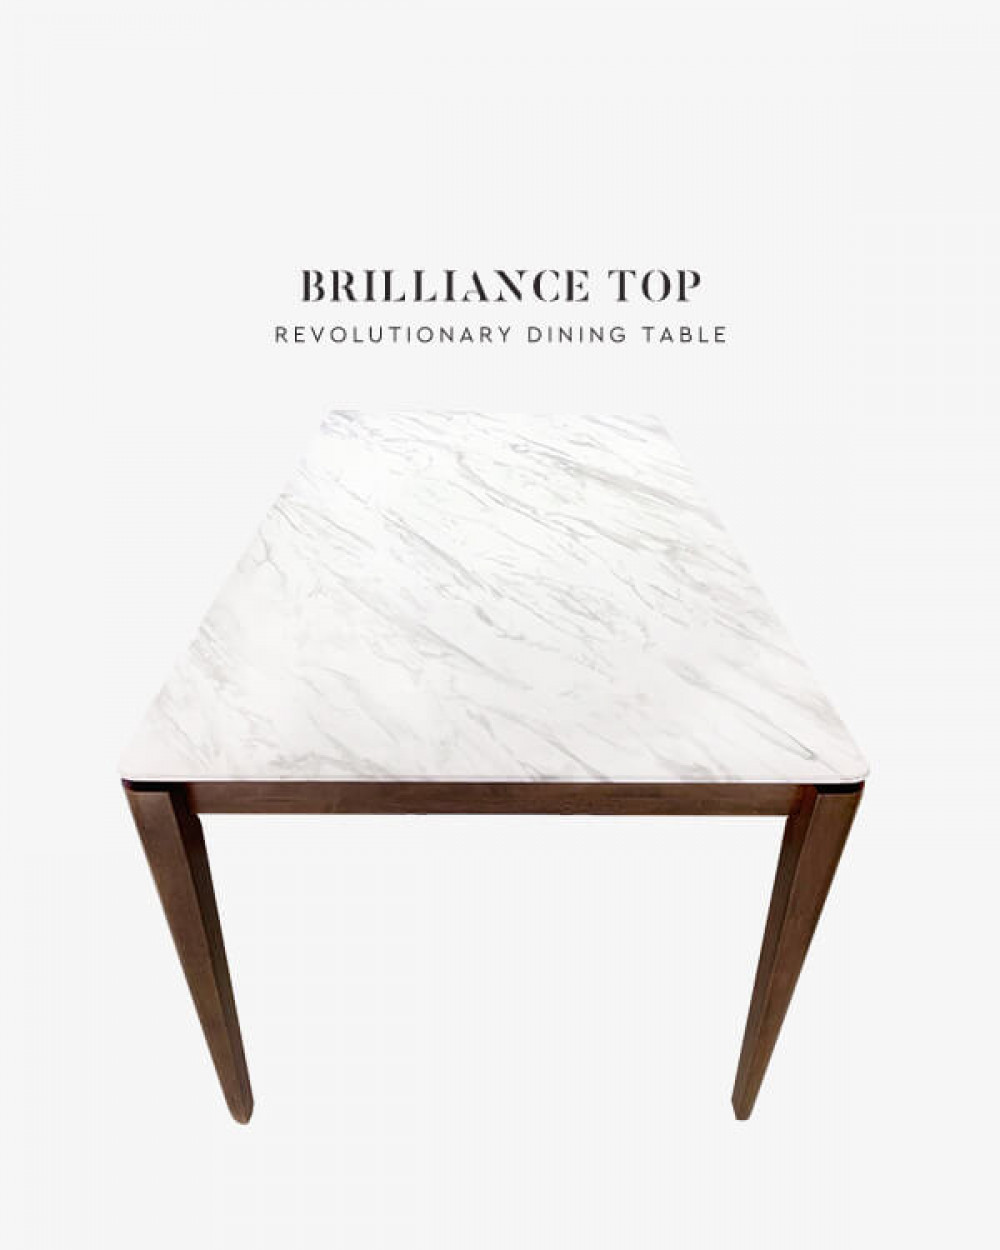 Brilliance Top | Kleberg Dining Table, Dark Emperador